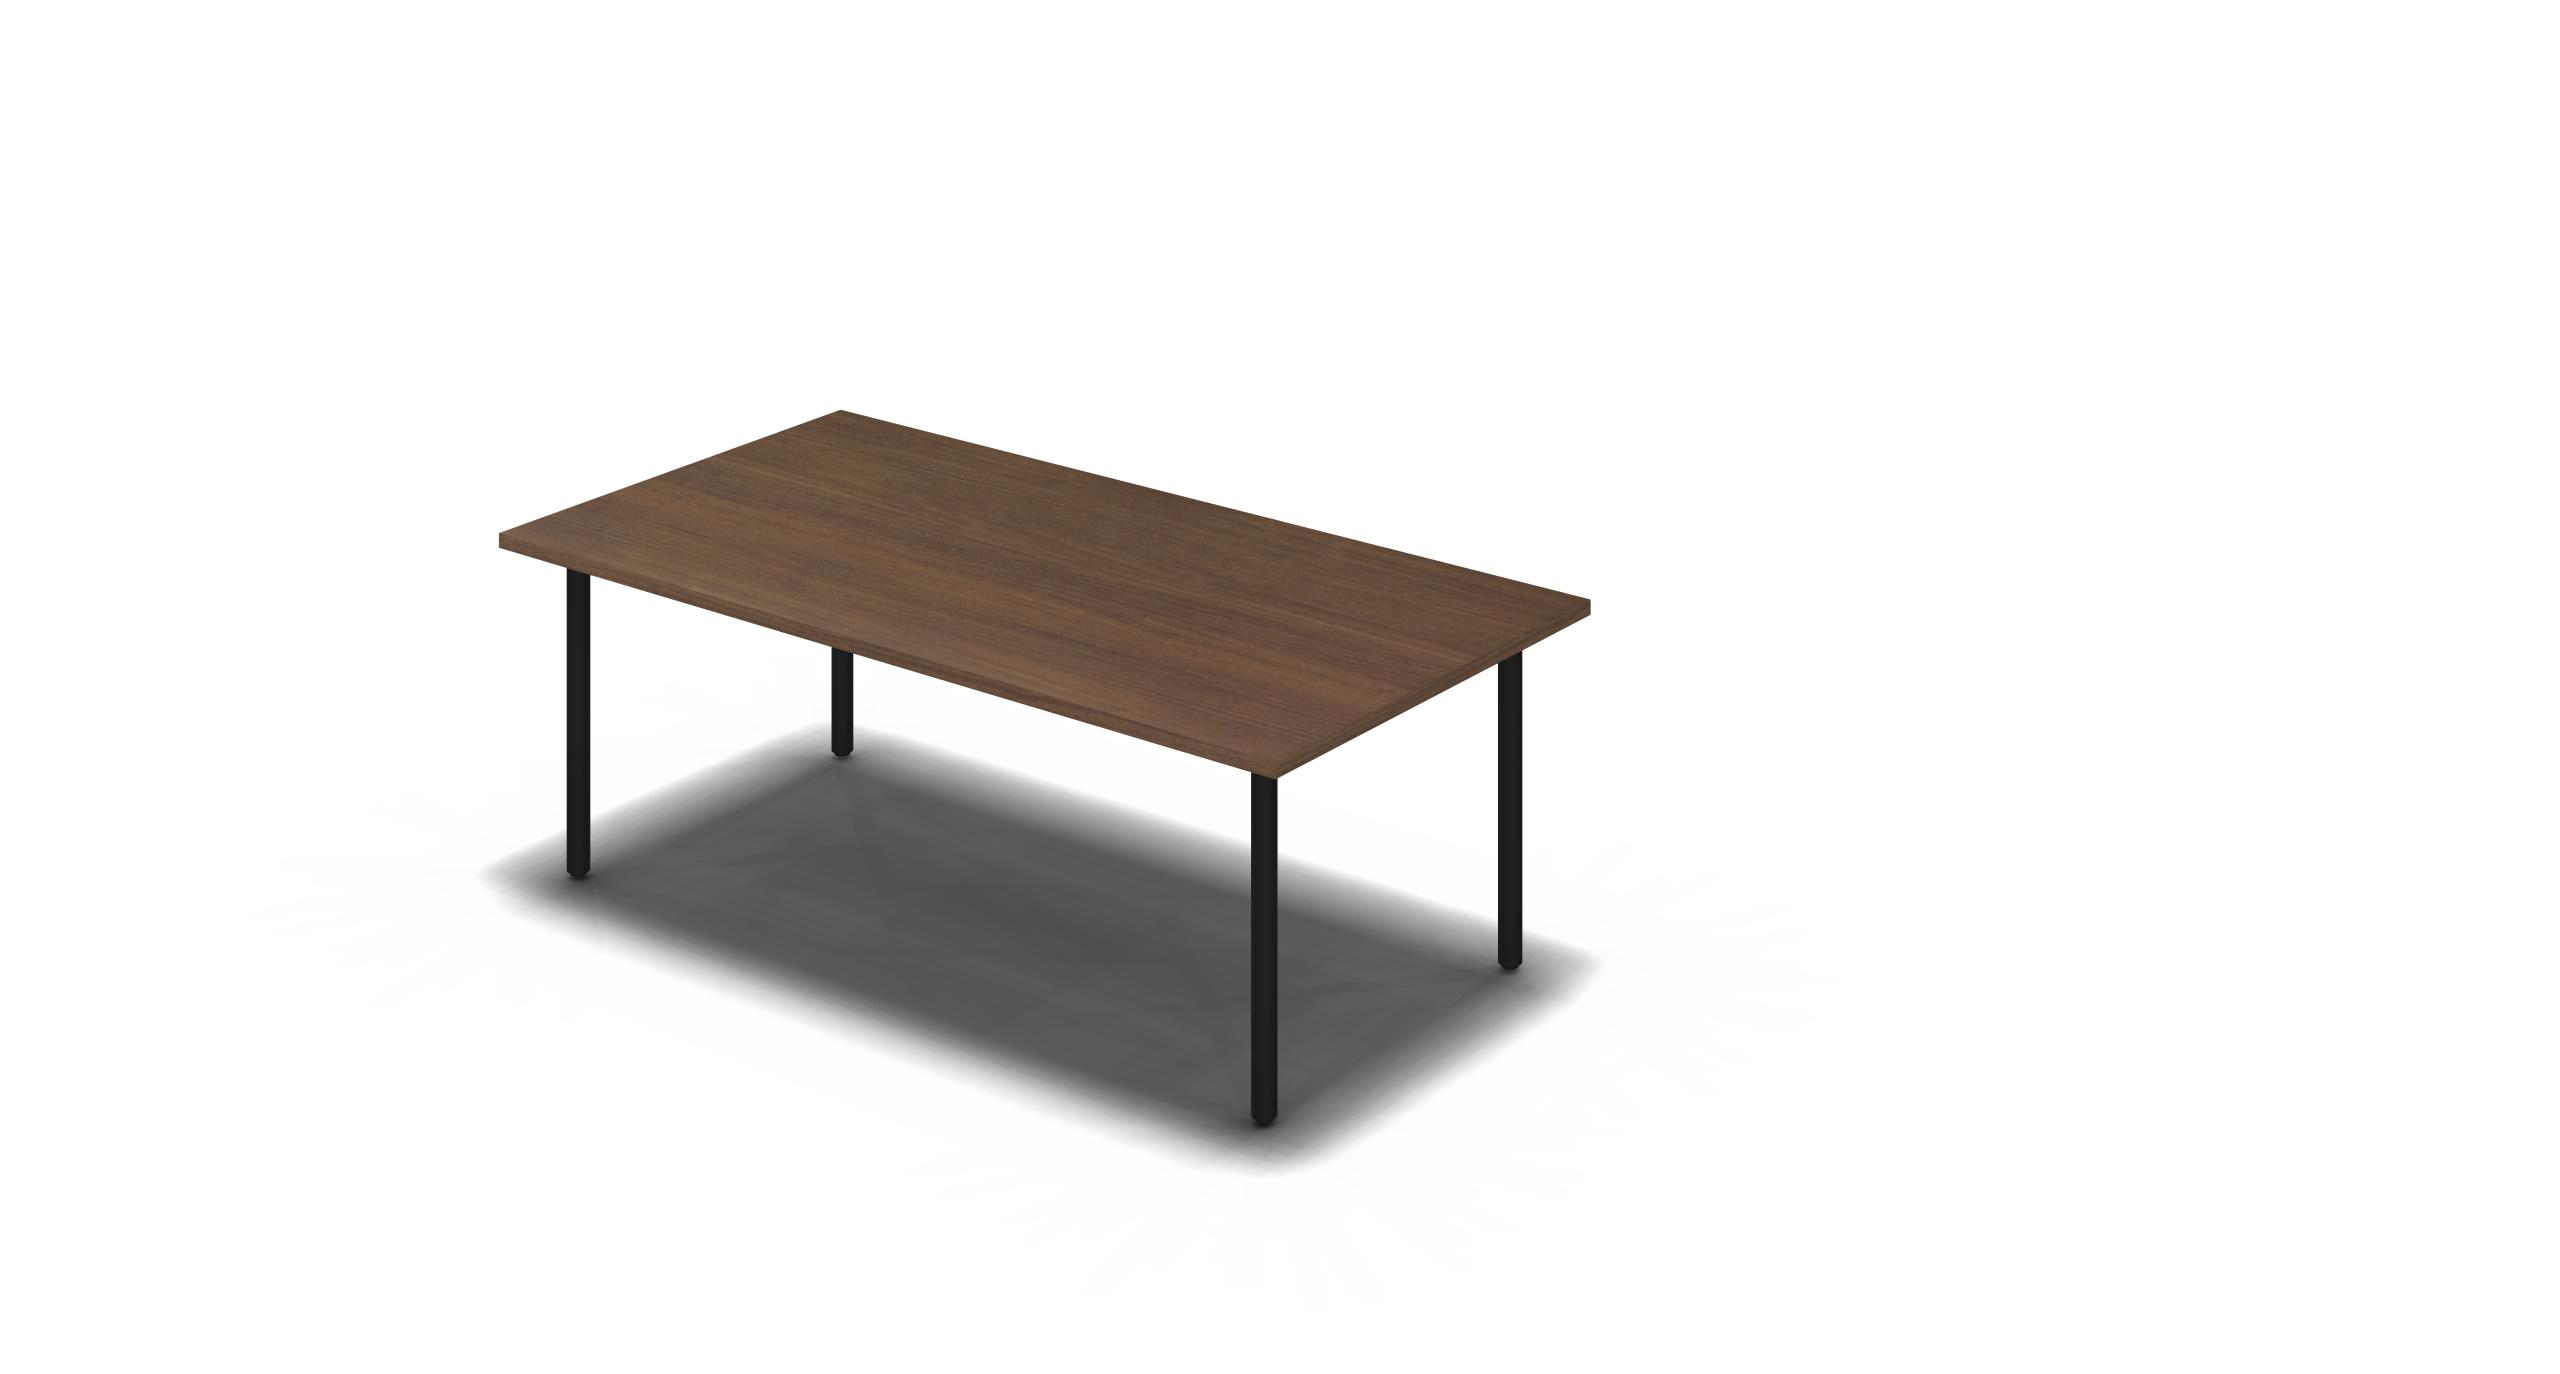 Table_Round_1800x900_Black_Walnut_noOption